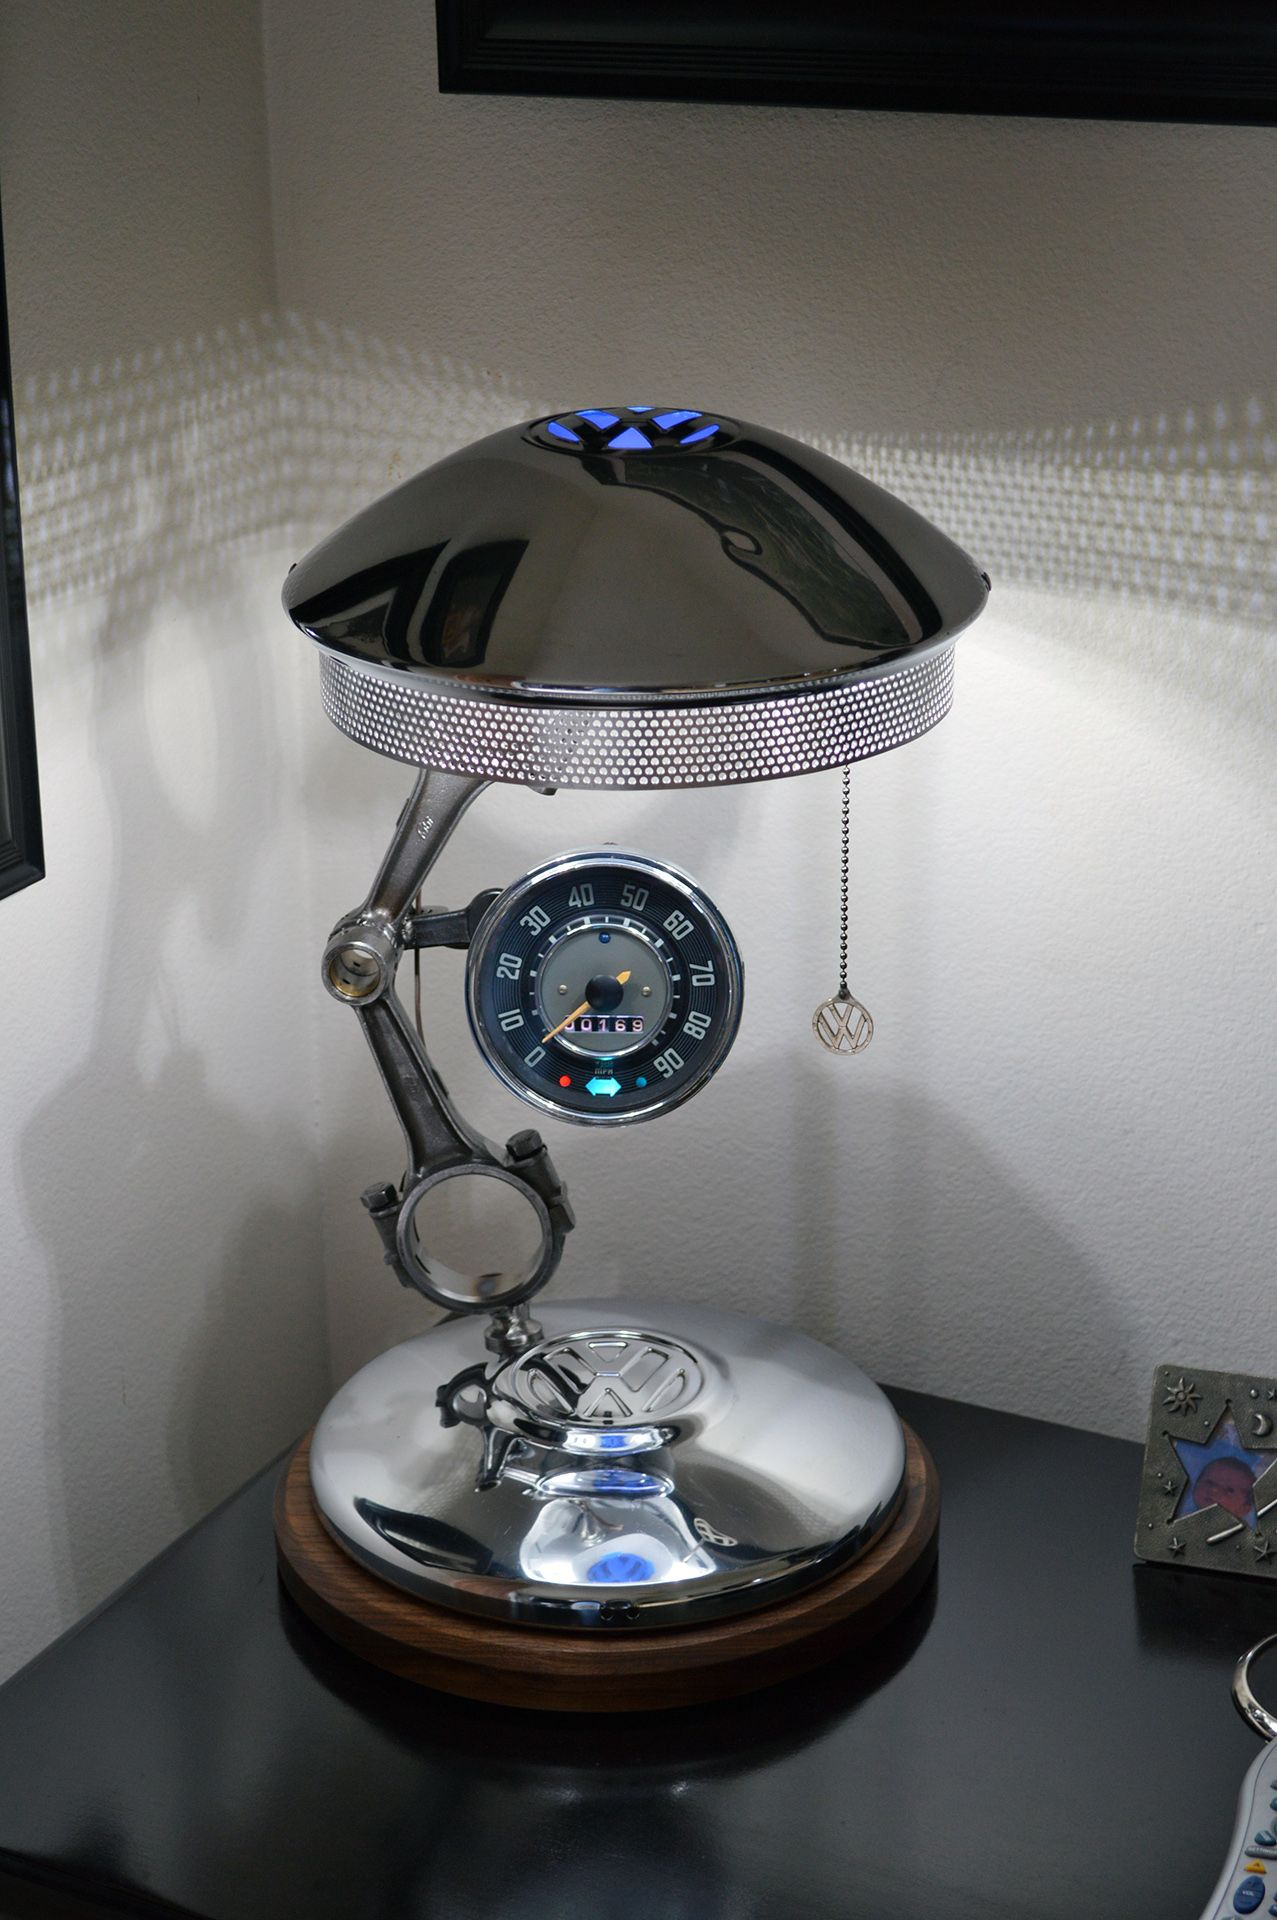 Faszinierend Möbel Aus Autoteilen Dekoration Von Luminária Partes De Carro